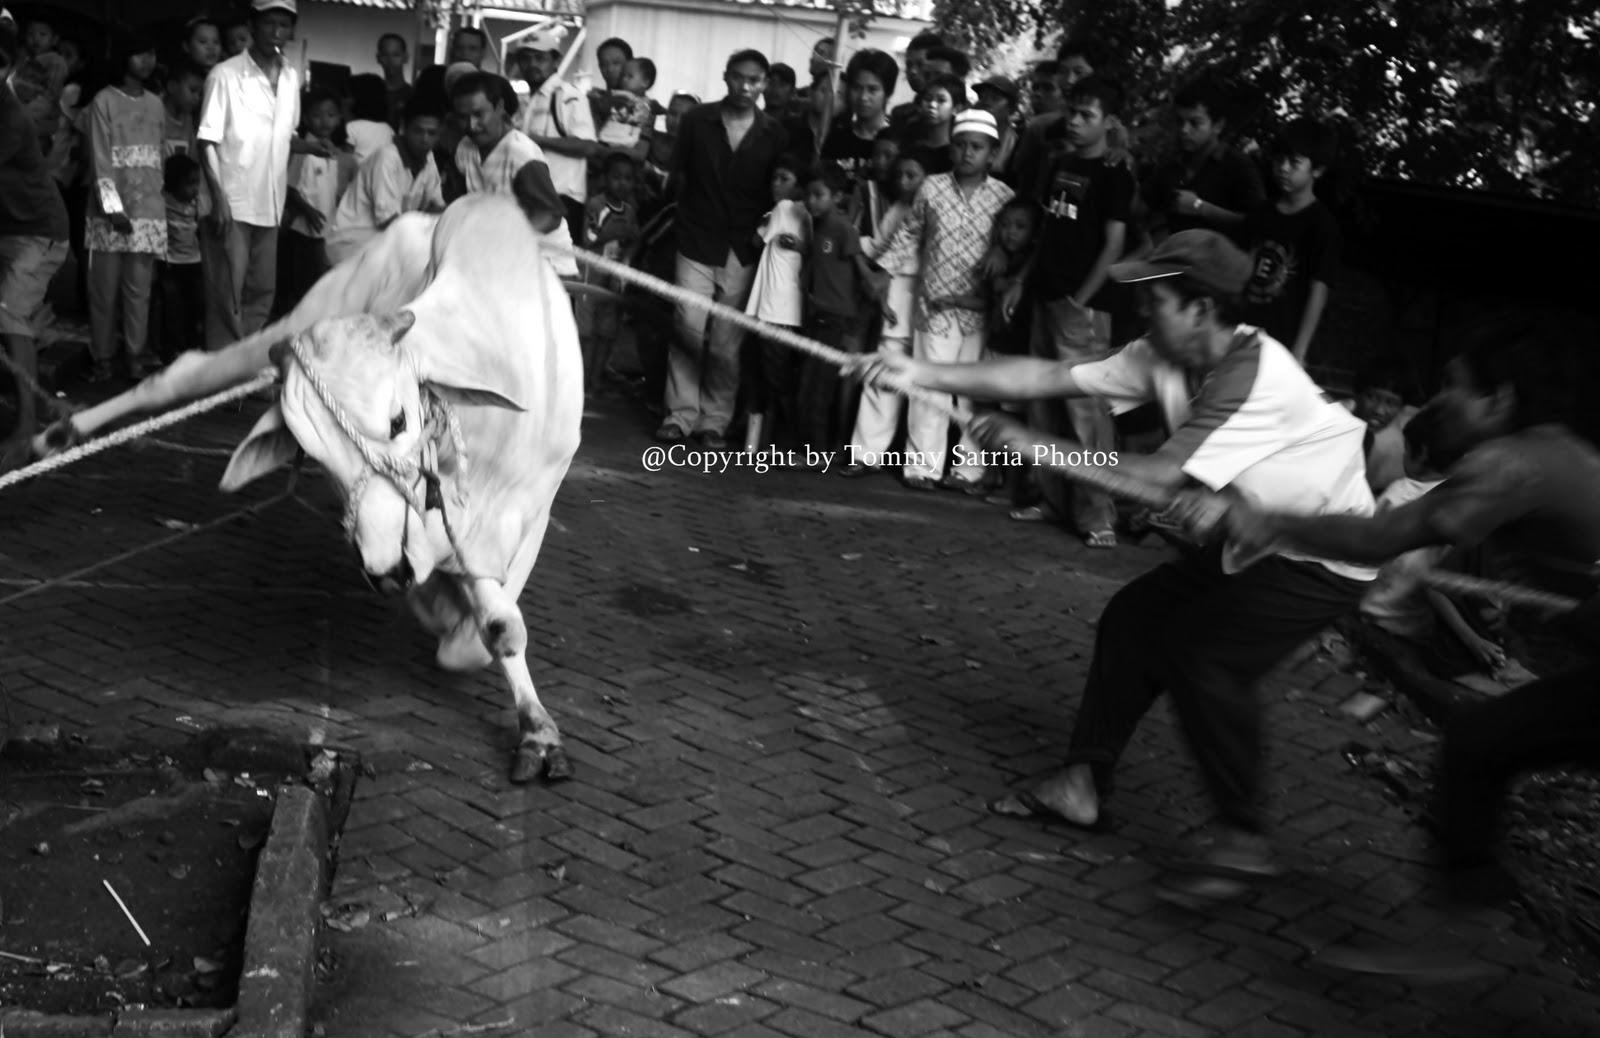 Story Cow Sacrifice At Eid al-Adha in Indonesia – Catatan Foto